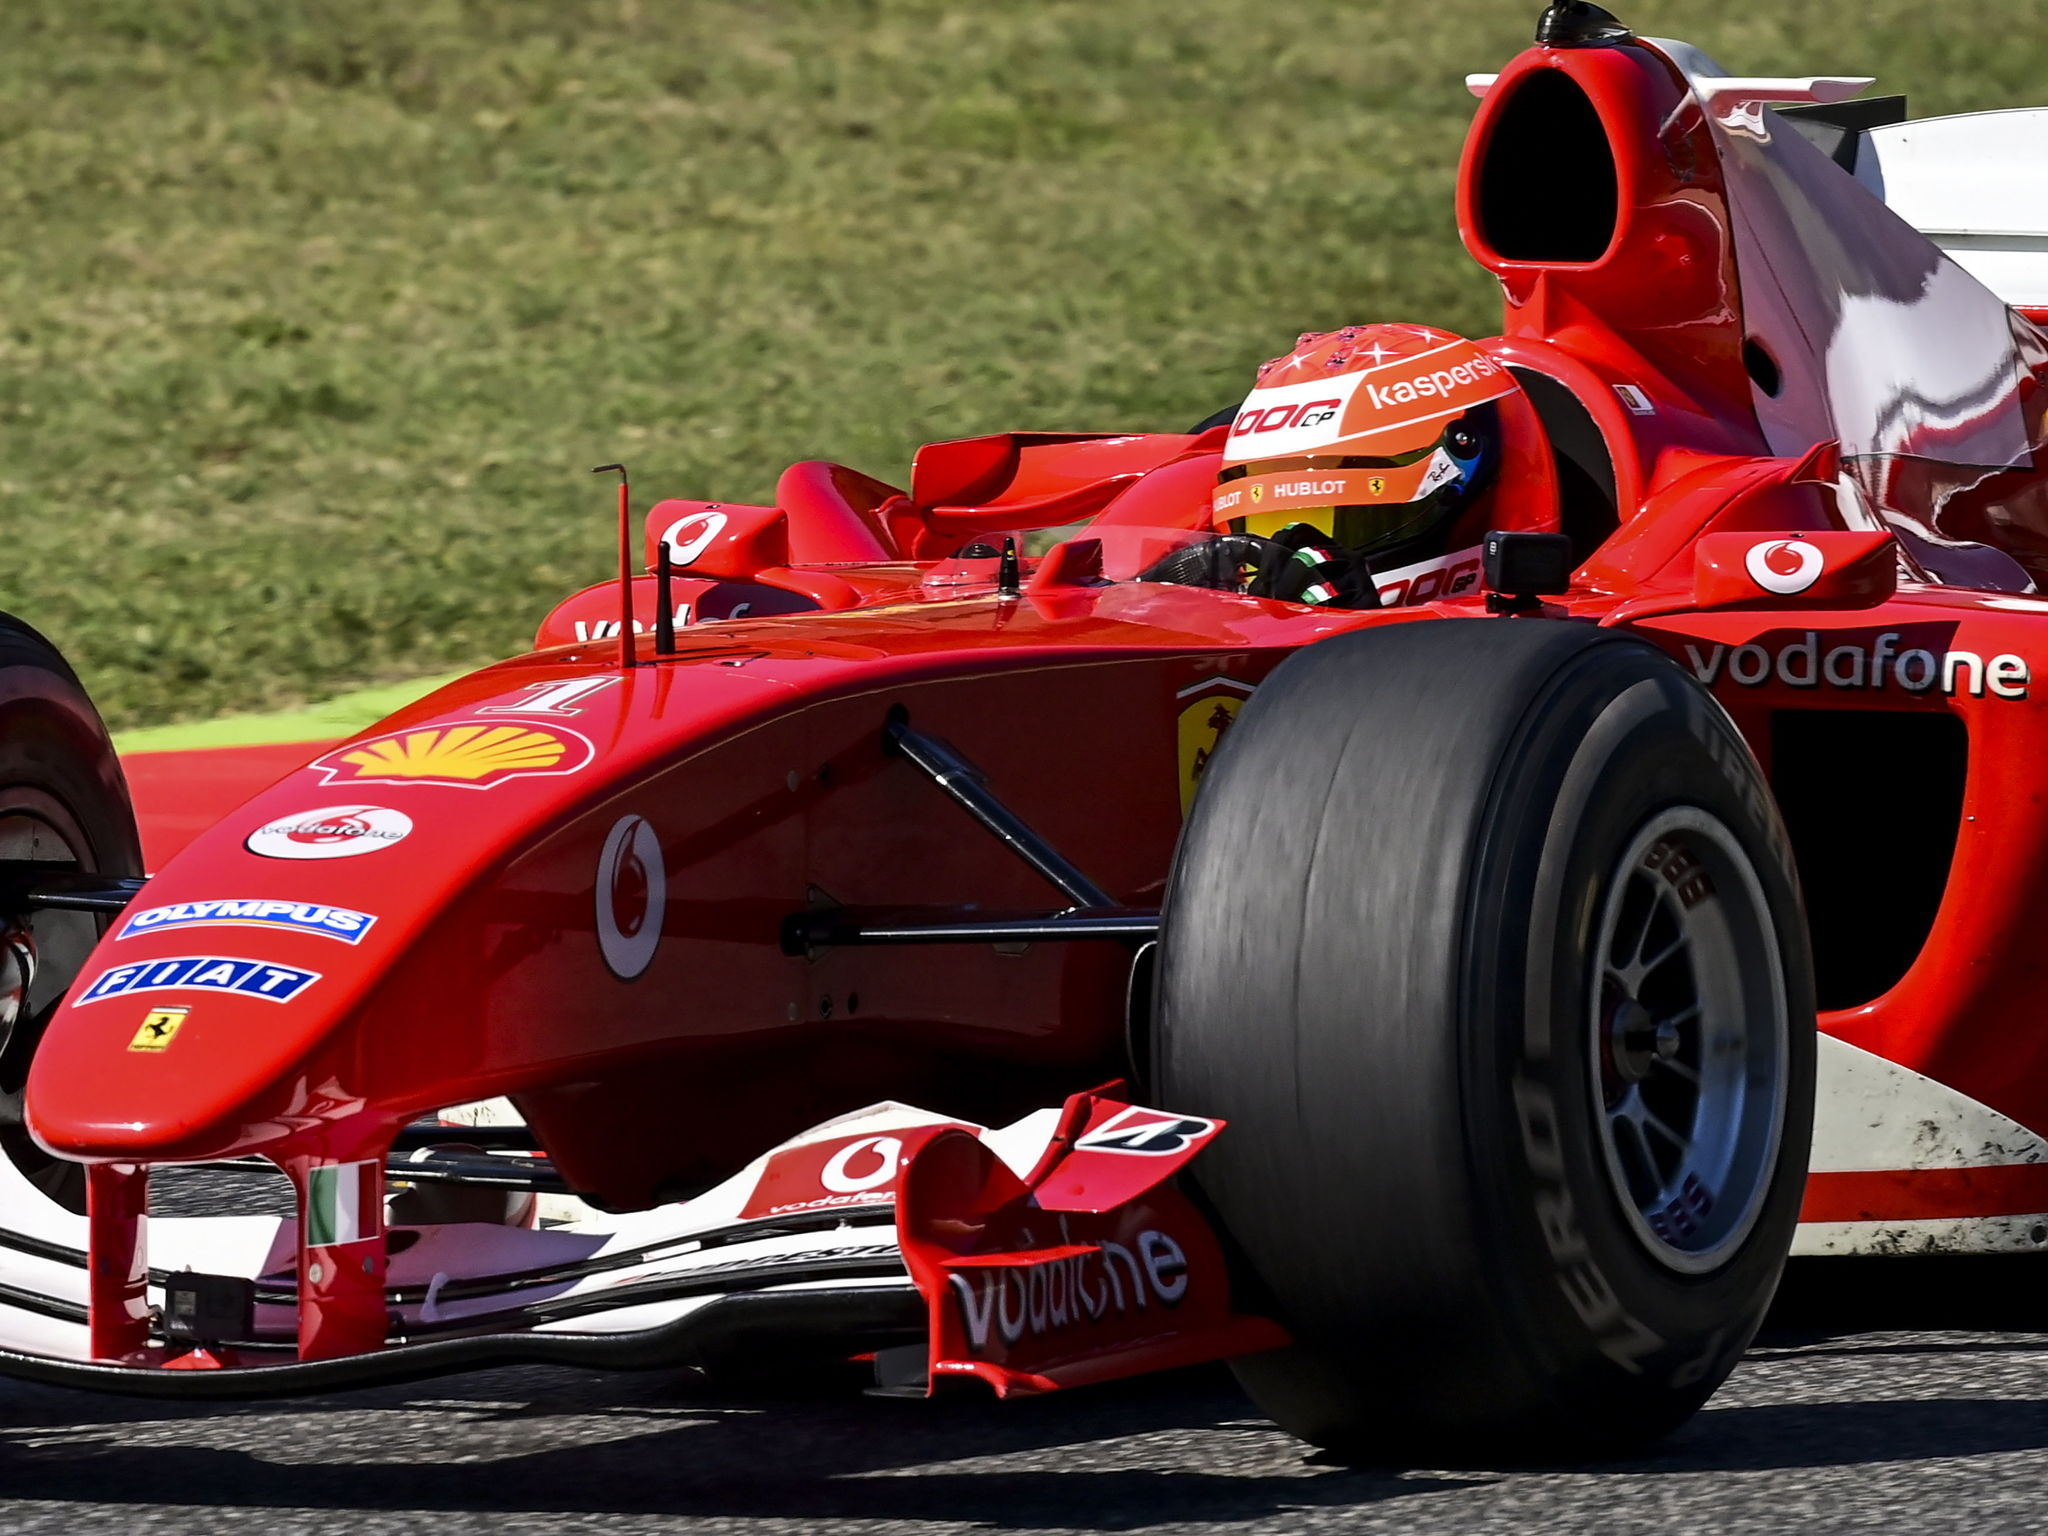 Mugello (Italy), 13/09/2020.- lt;HIT gt;Mick lt;/HIT gt; lt;HIT gt;Schumacher lt;/HIT gt; drives the Ferrari F2004 of his father Michael lt;HIT gt;Schumacher lt;/HIT gt; during a display run ahead of the Formula One Grand Prix of Tuscany at the race track in Mugello, Italy 13 September 2020. (Fórmula Uno, Italia) EFE/EPA/Miguel Medina / Pool